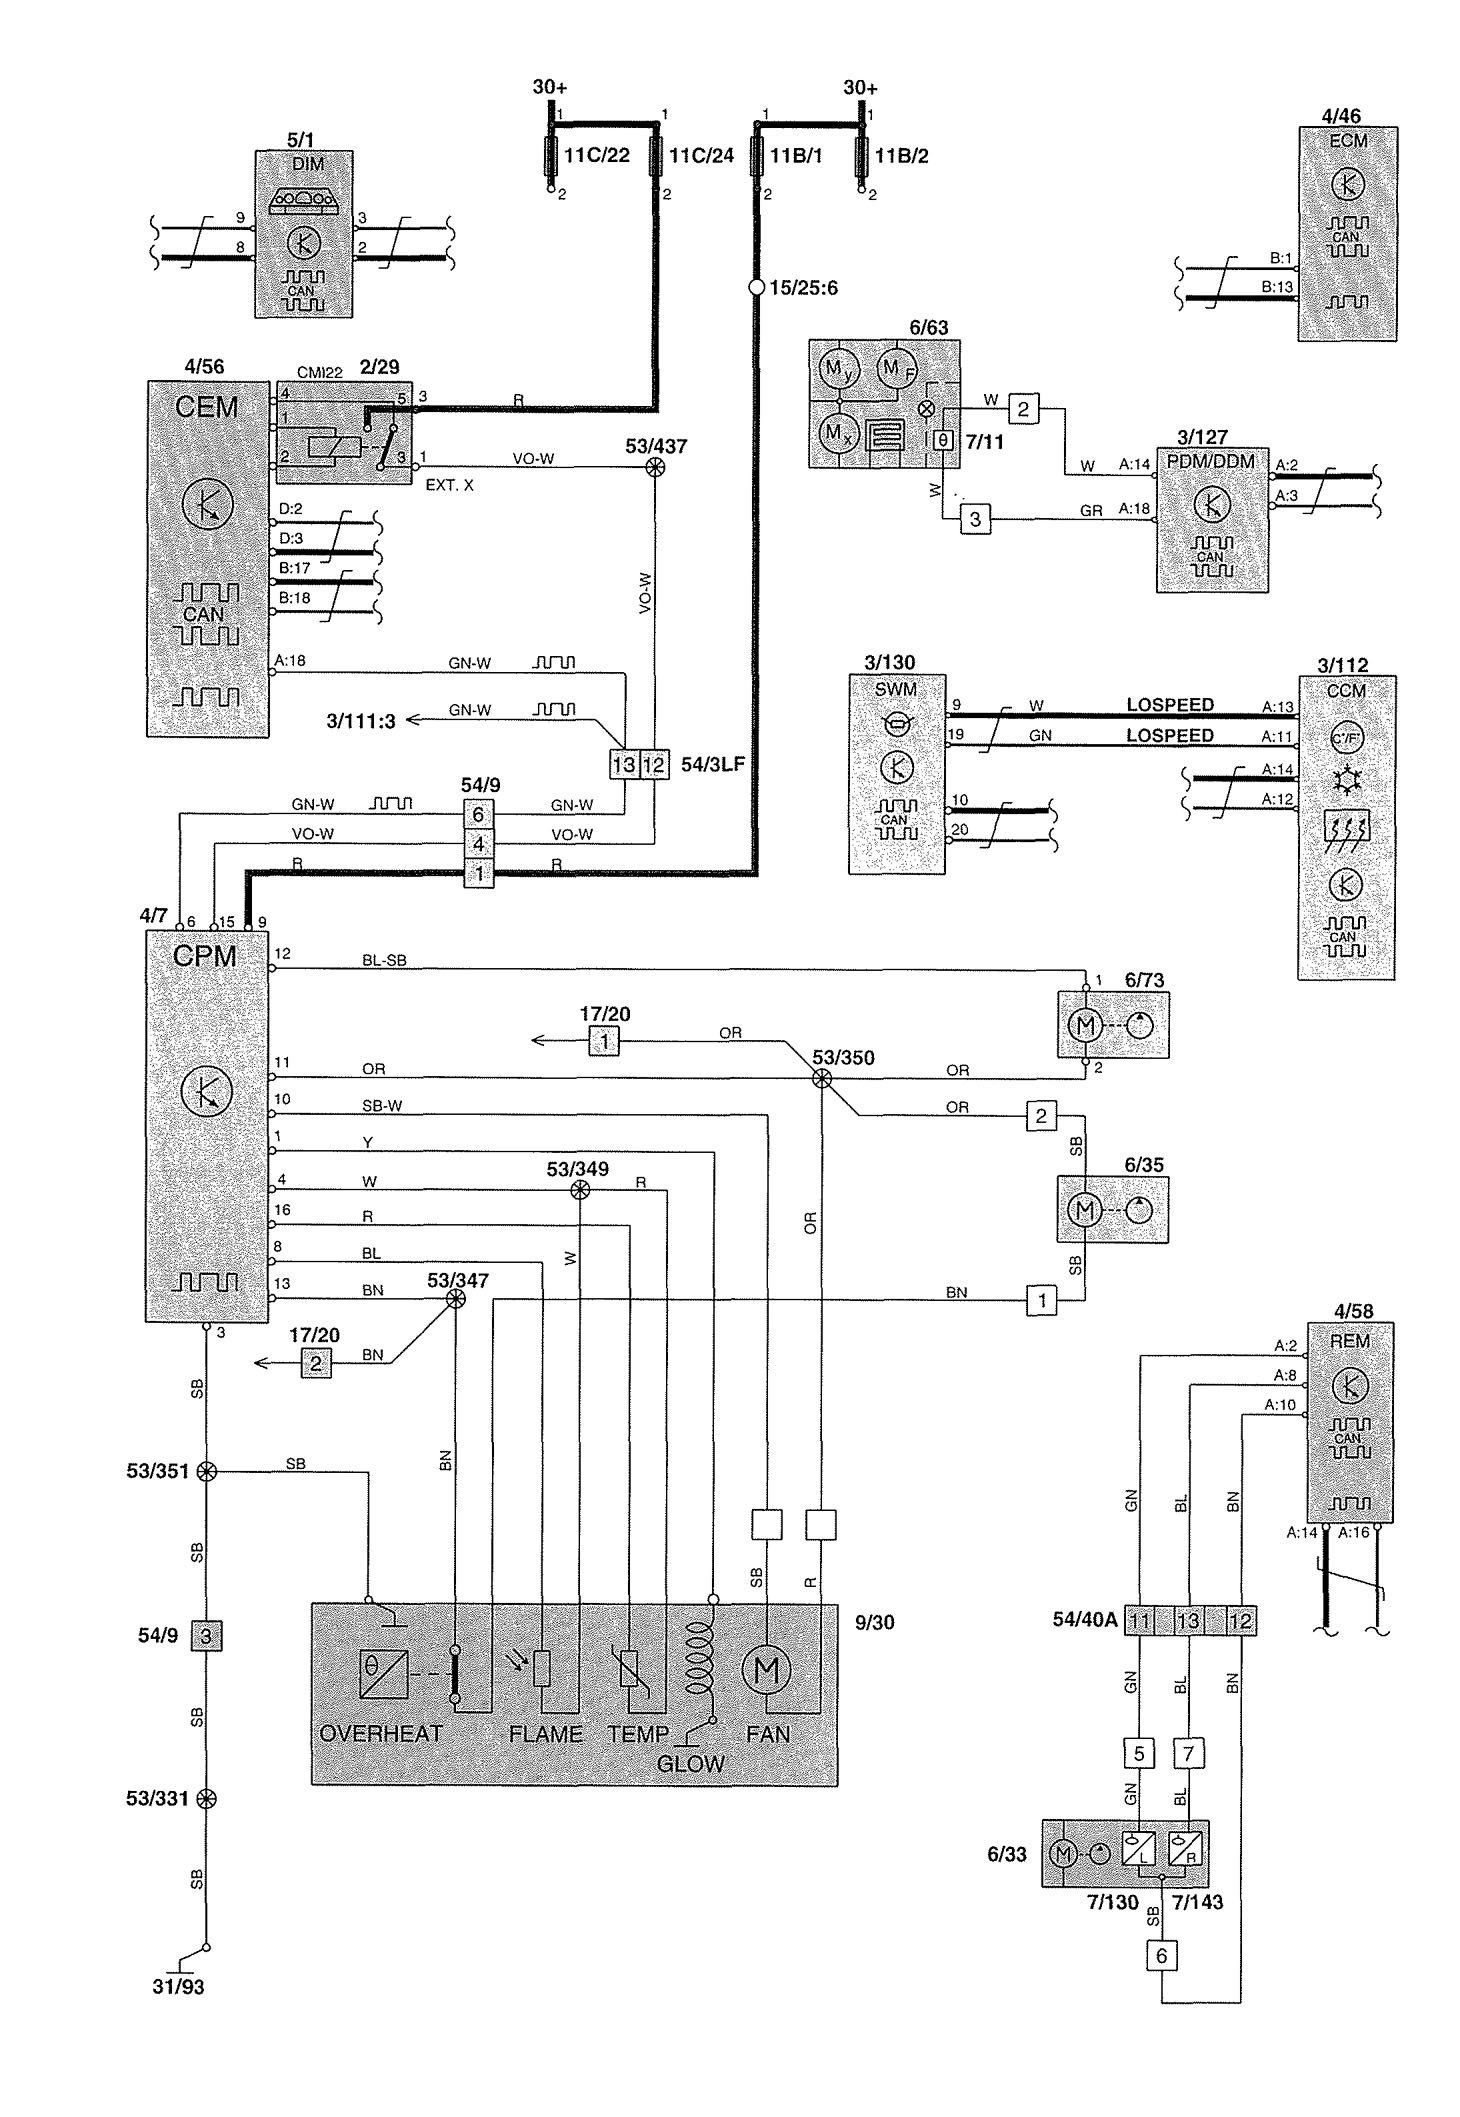 [DIAGRAM_34OR]  OFFICIAL WORKSHOP Manual Service Repair Volvo XC90 2002-2014 Wiring Diagram  gtti.gm | 2002 Volvo Wiring Diagrams |  | GTTI